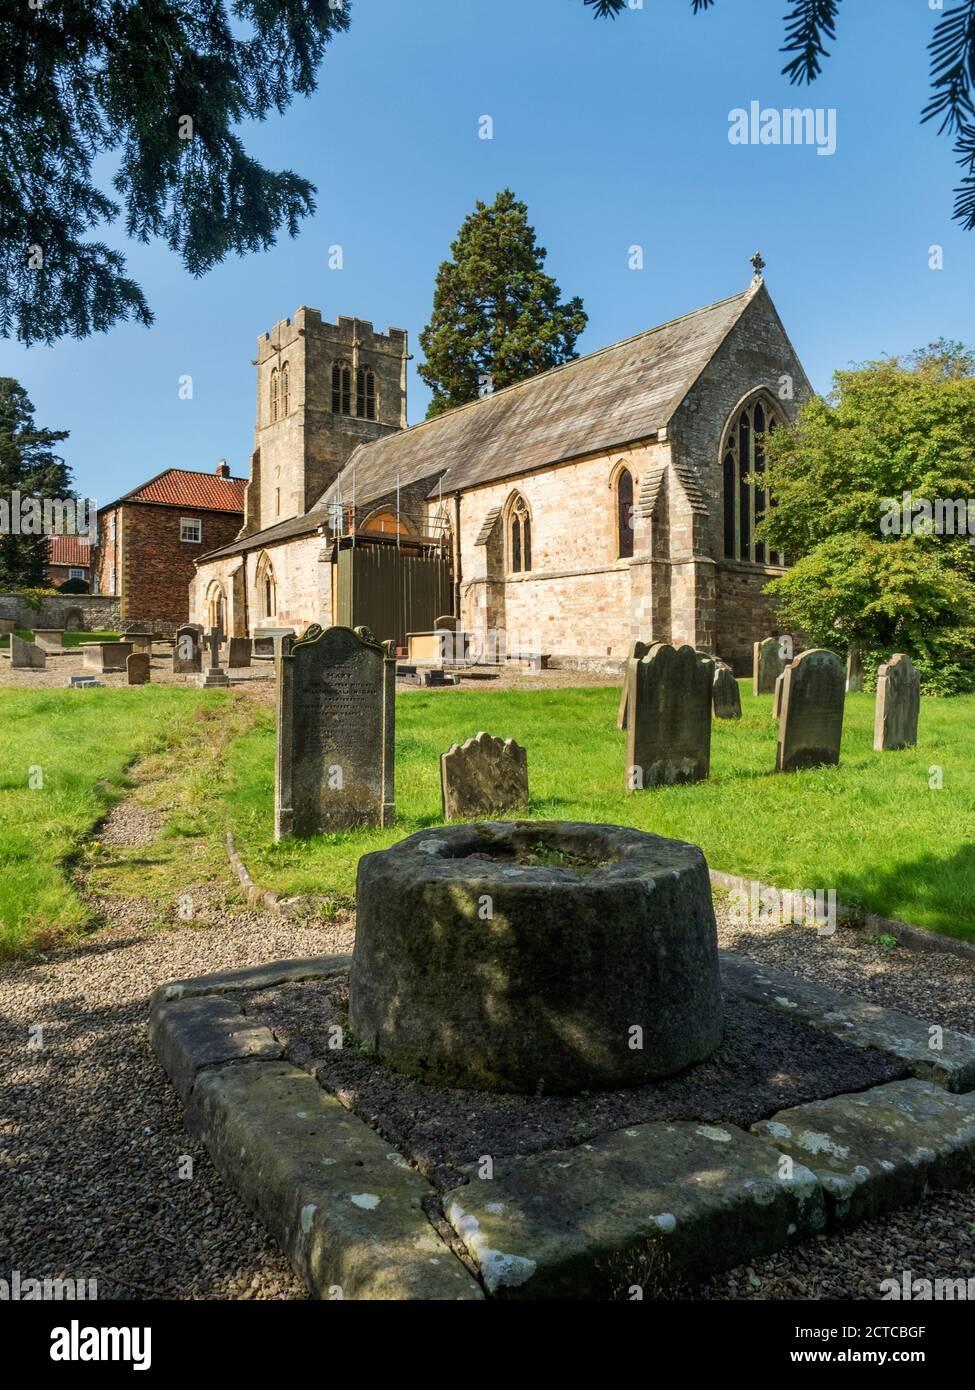 Church of St Mary a grade I listed building in Goldsborough near Knaresborough North Yorkshire England Stock Photo